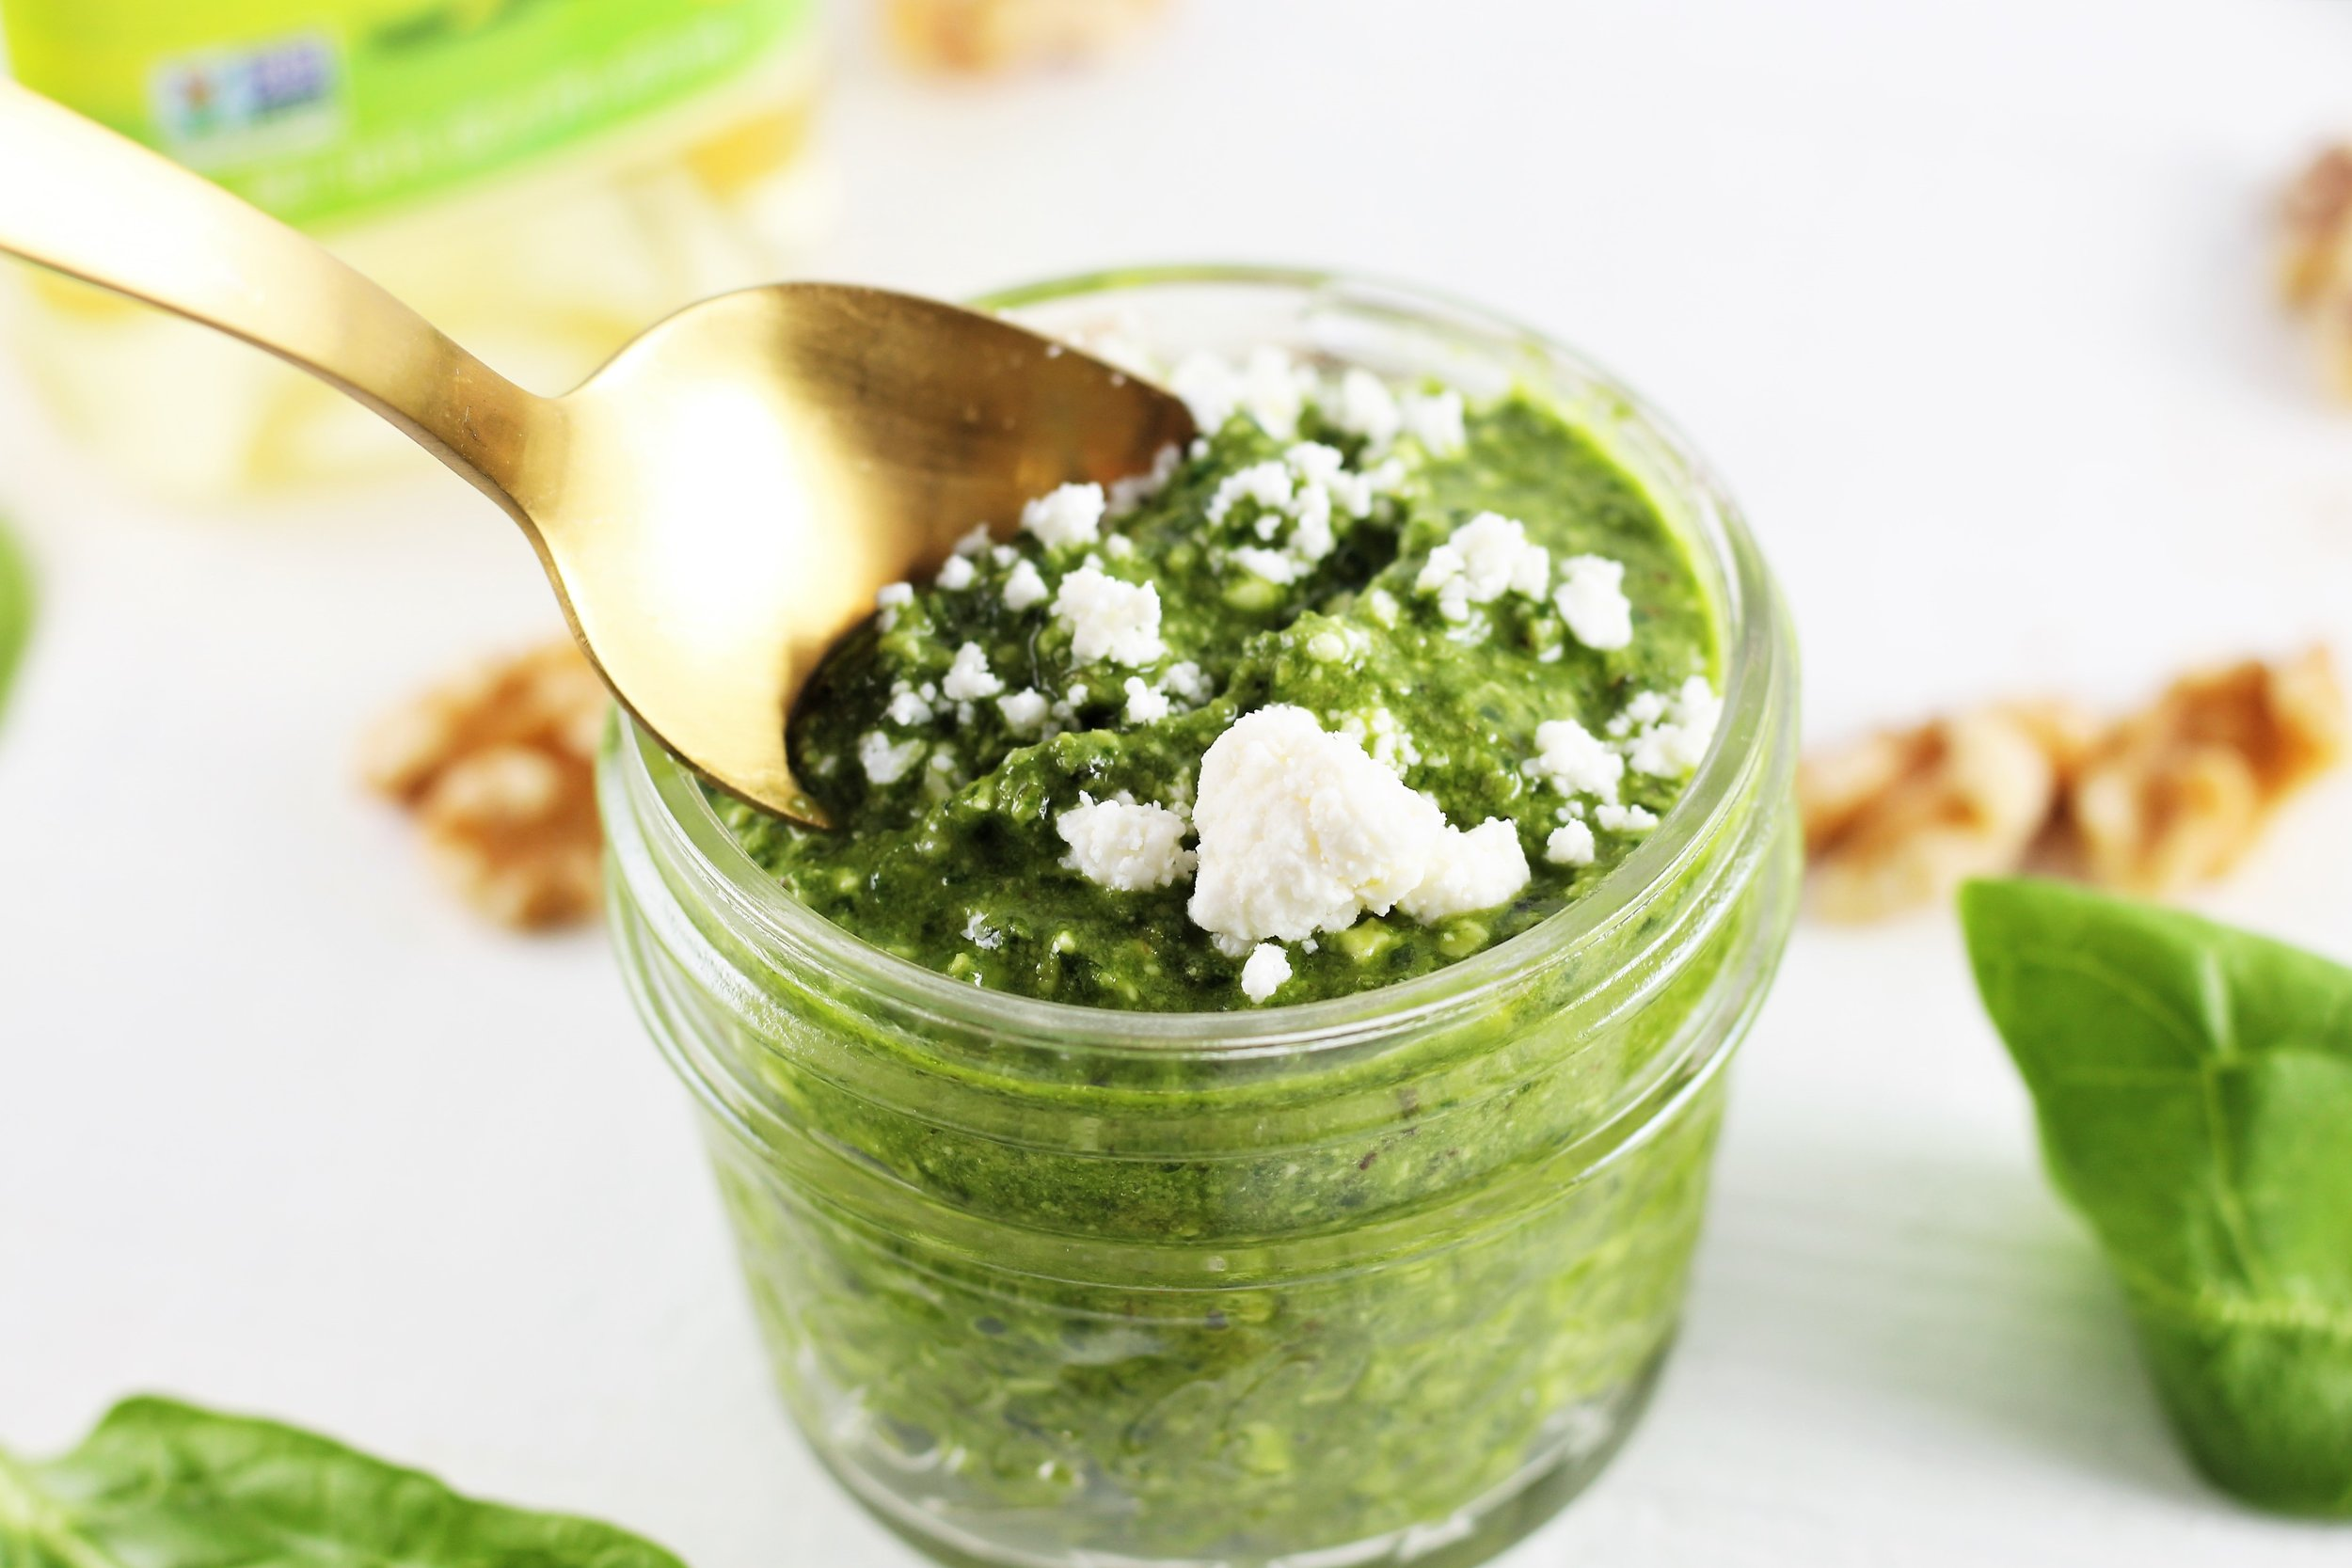 Spinach Walnut and Feta Pesto Sauce